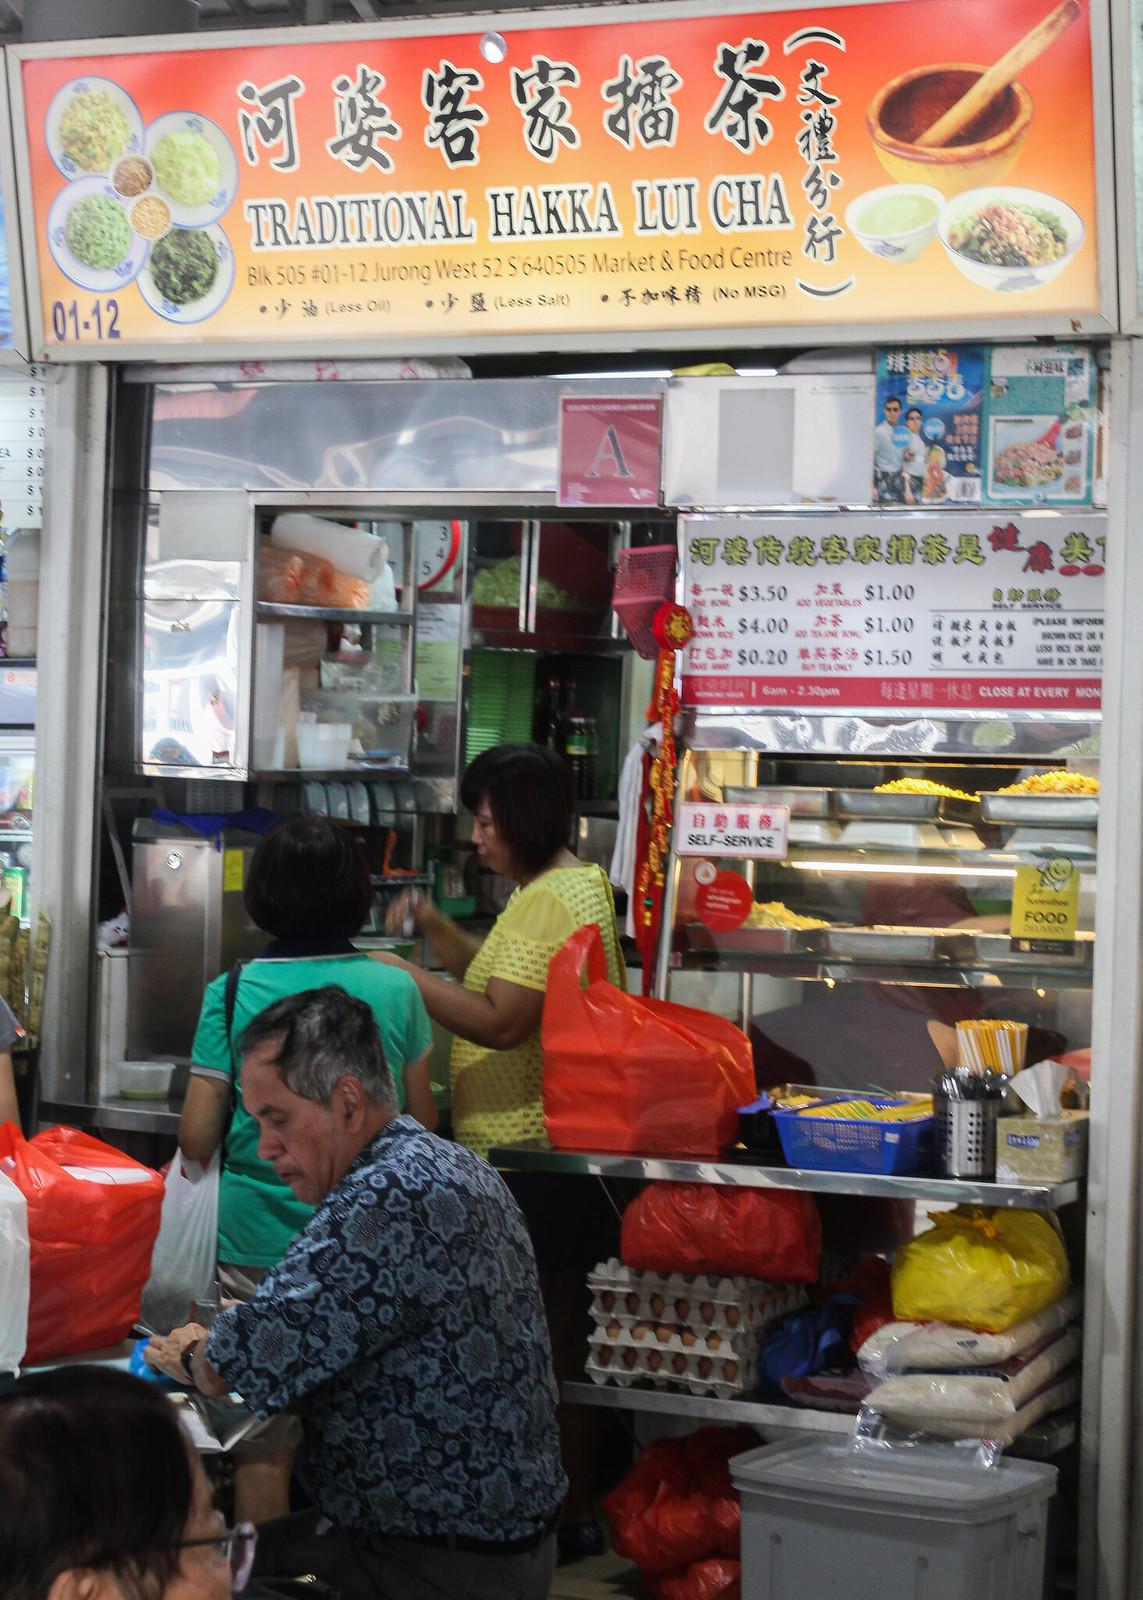 Traditional Hakka Lui Cha Storefront